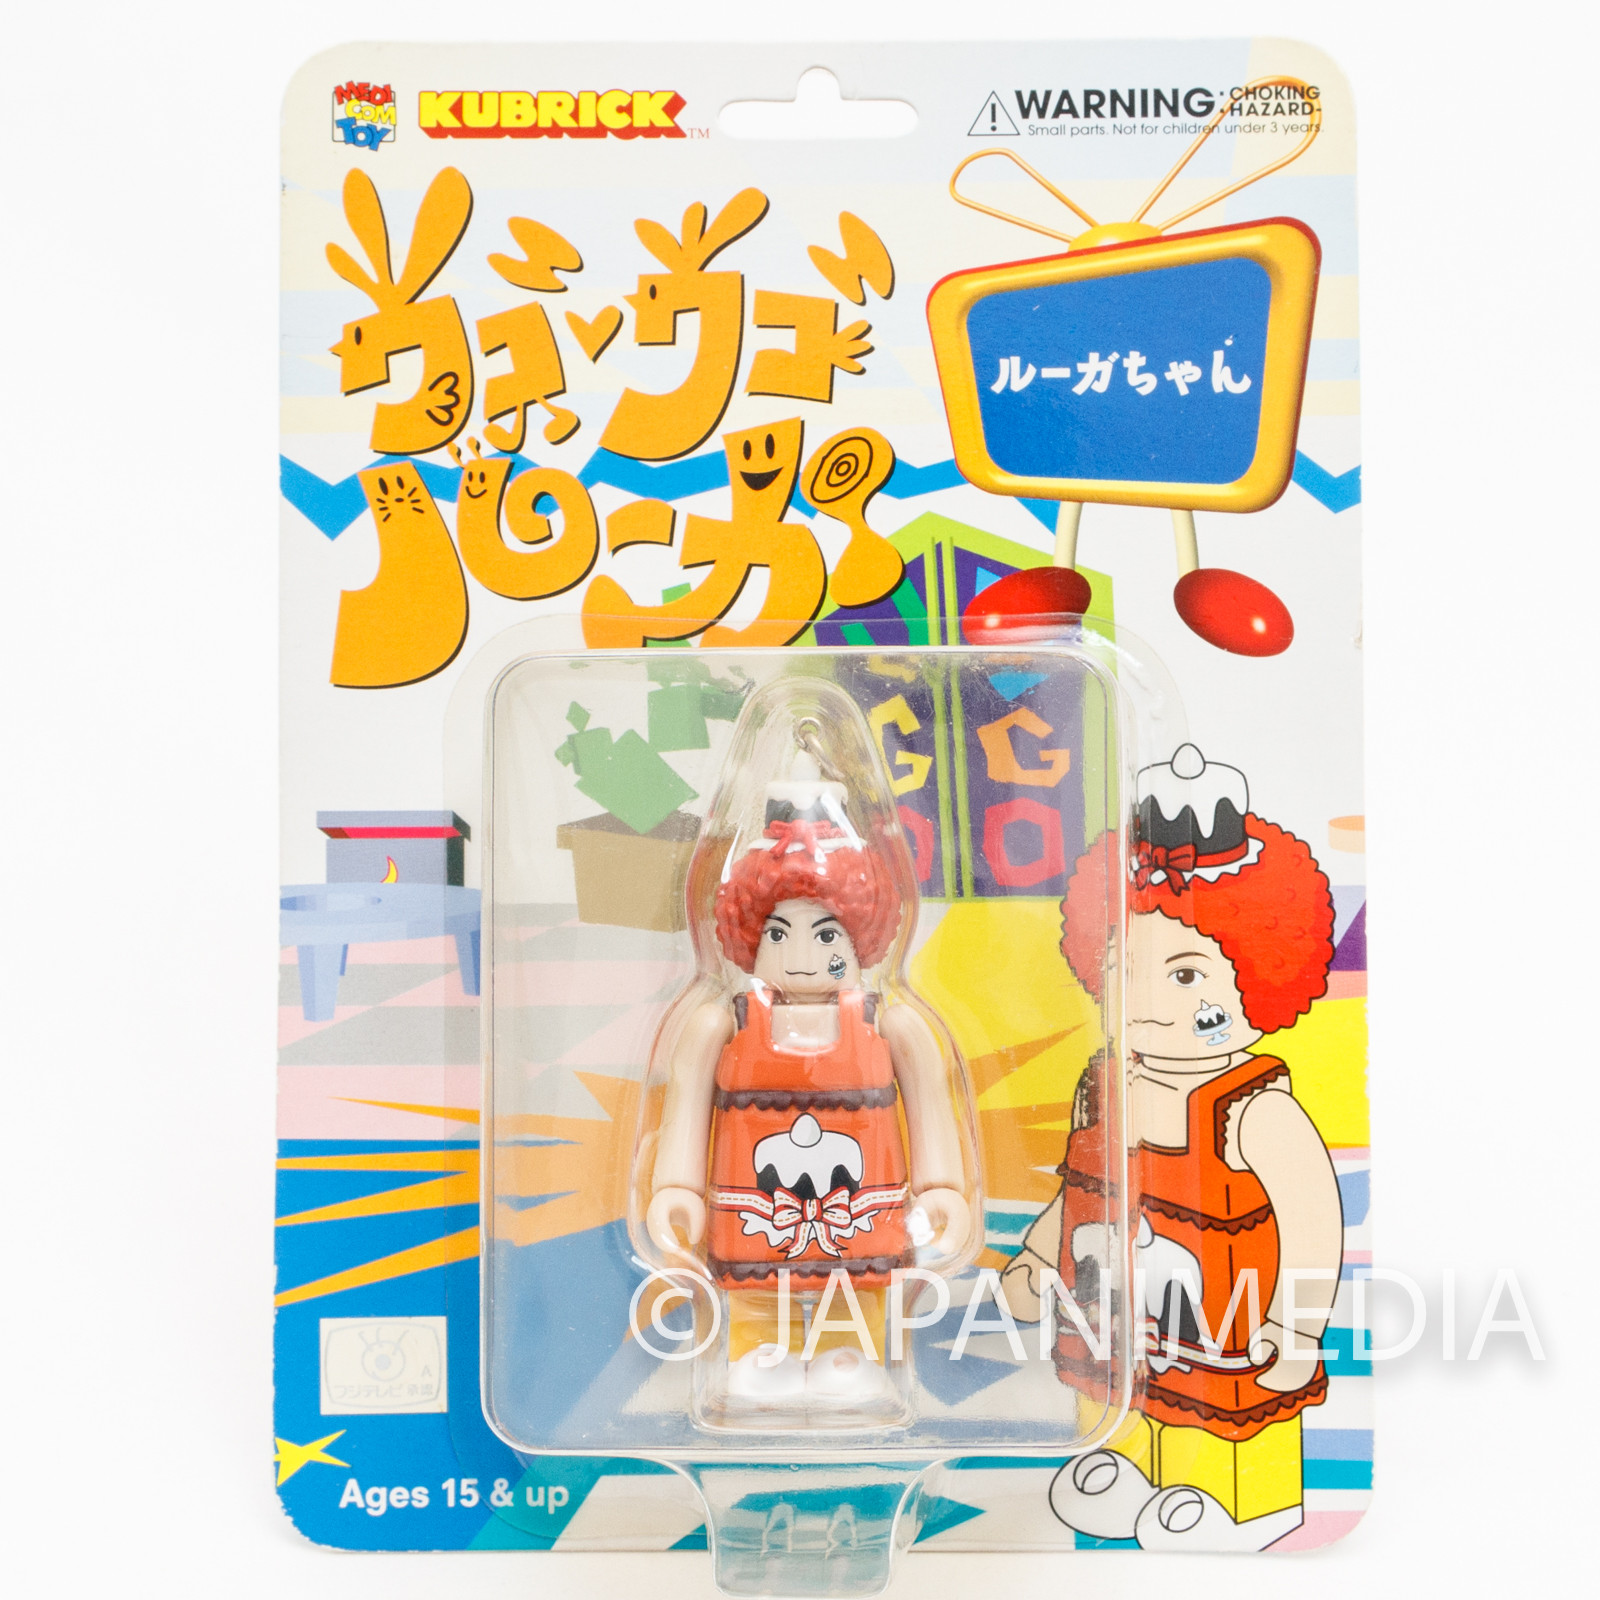 Kubrick UgoUgo Luga Luga-chan Figure Medicom Toy Fuji TV JAPAN ANIME